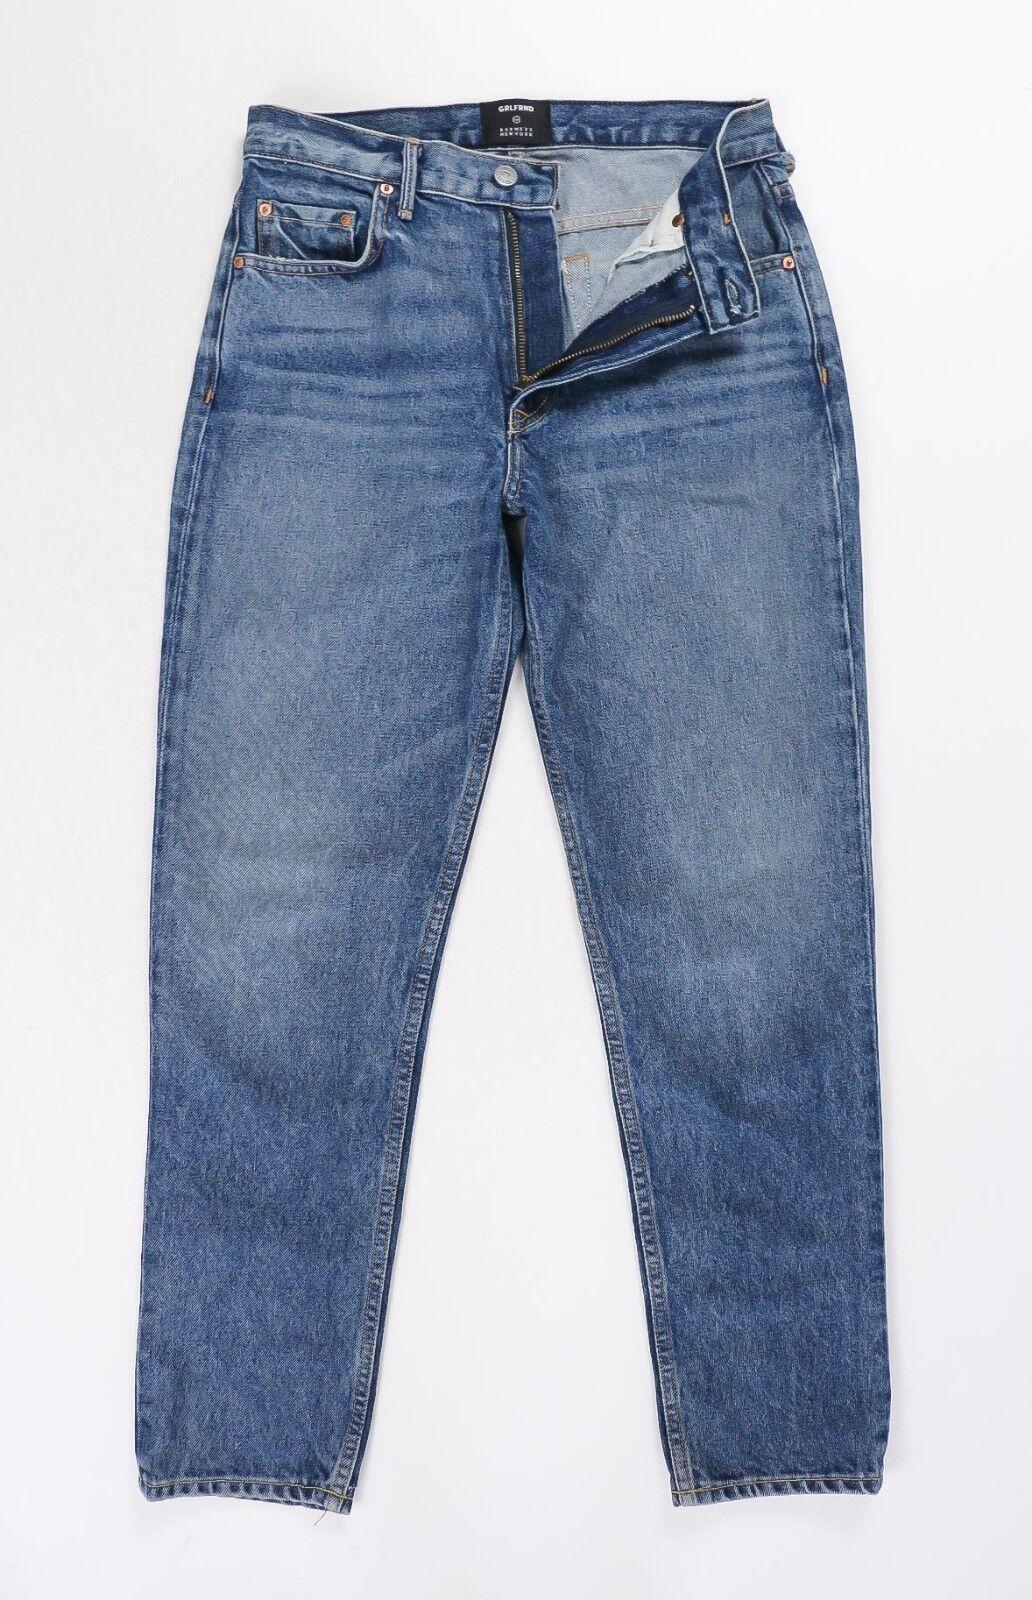 GRLFRND x Barneys Women's Jane Denim Jeans Size 26 x 28